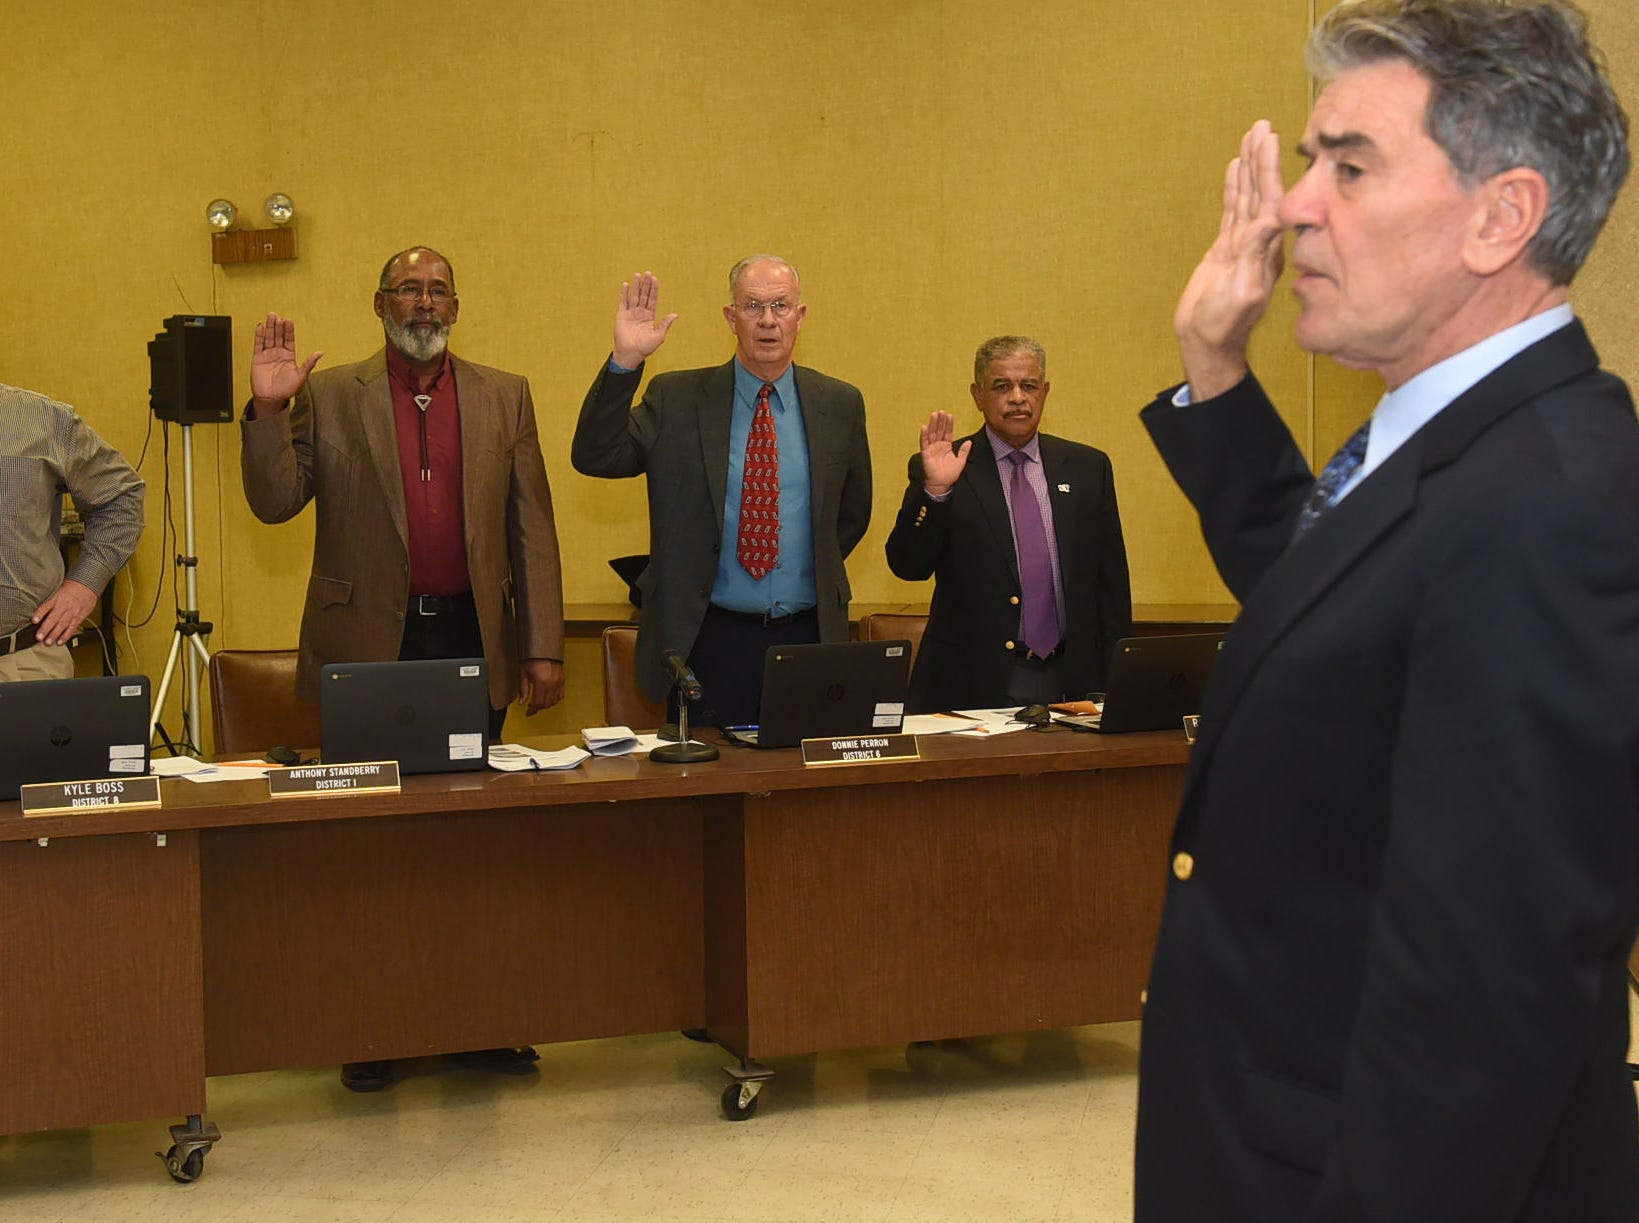 St. Landry Parish School Board members sworn in during Thursday's monthly meeting.